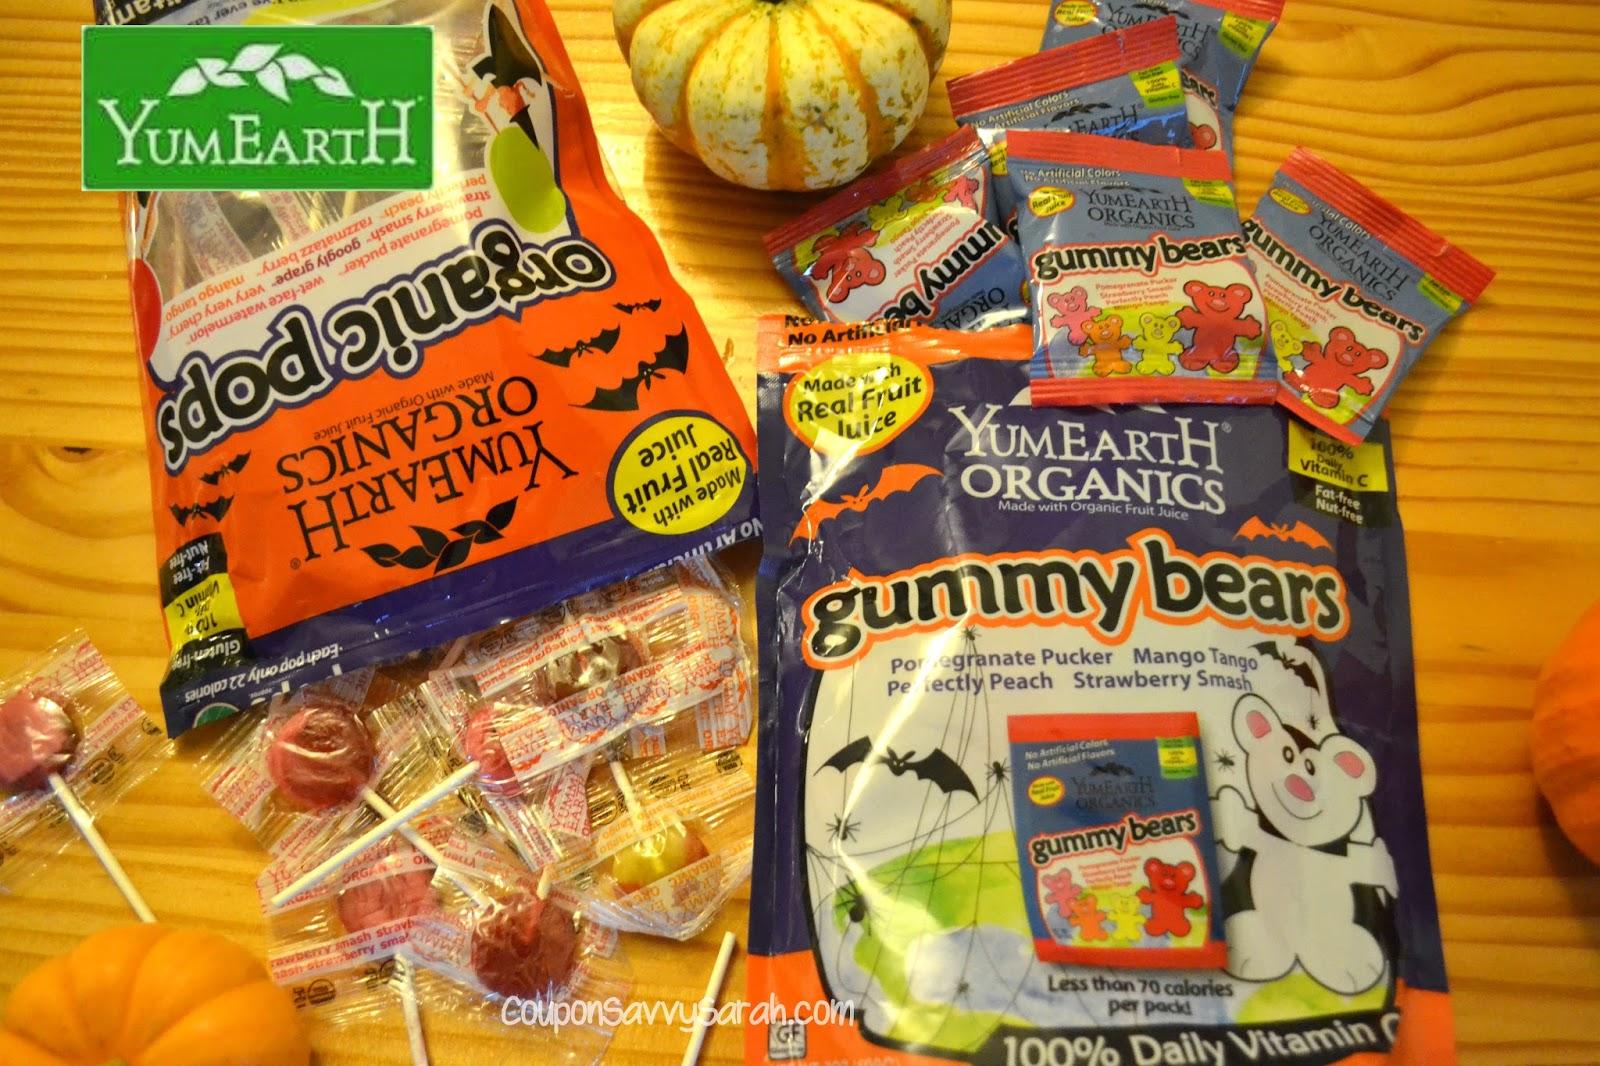 stock up for halloween on yumearth organic treats yumearth glutenfree nutfree dairyfree organic